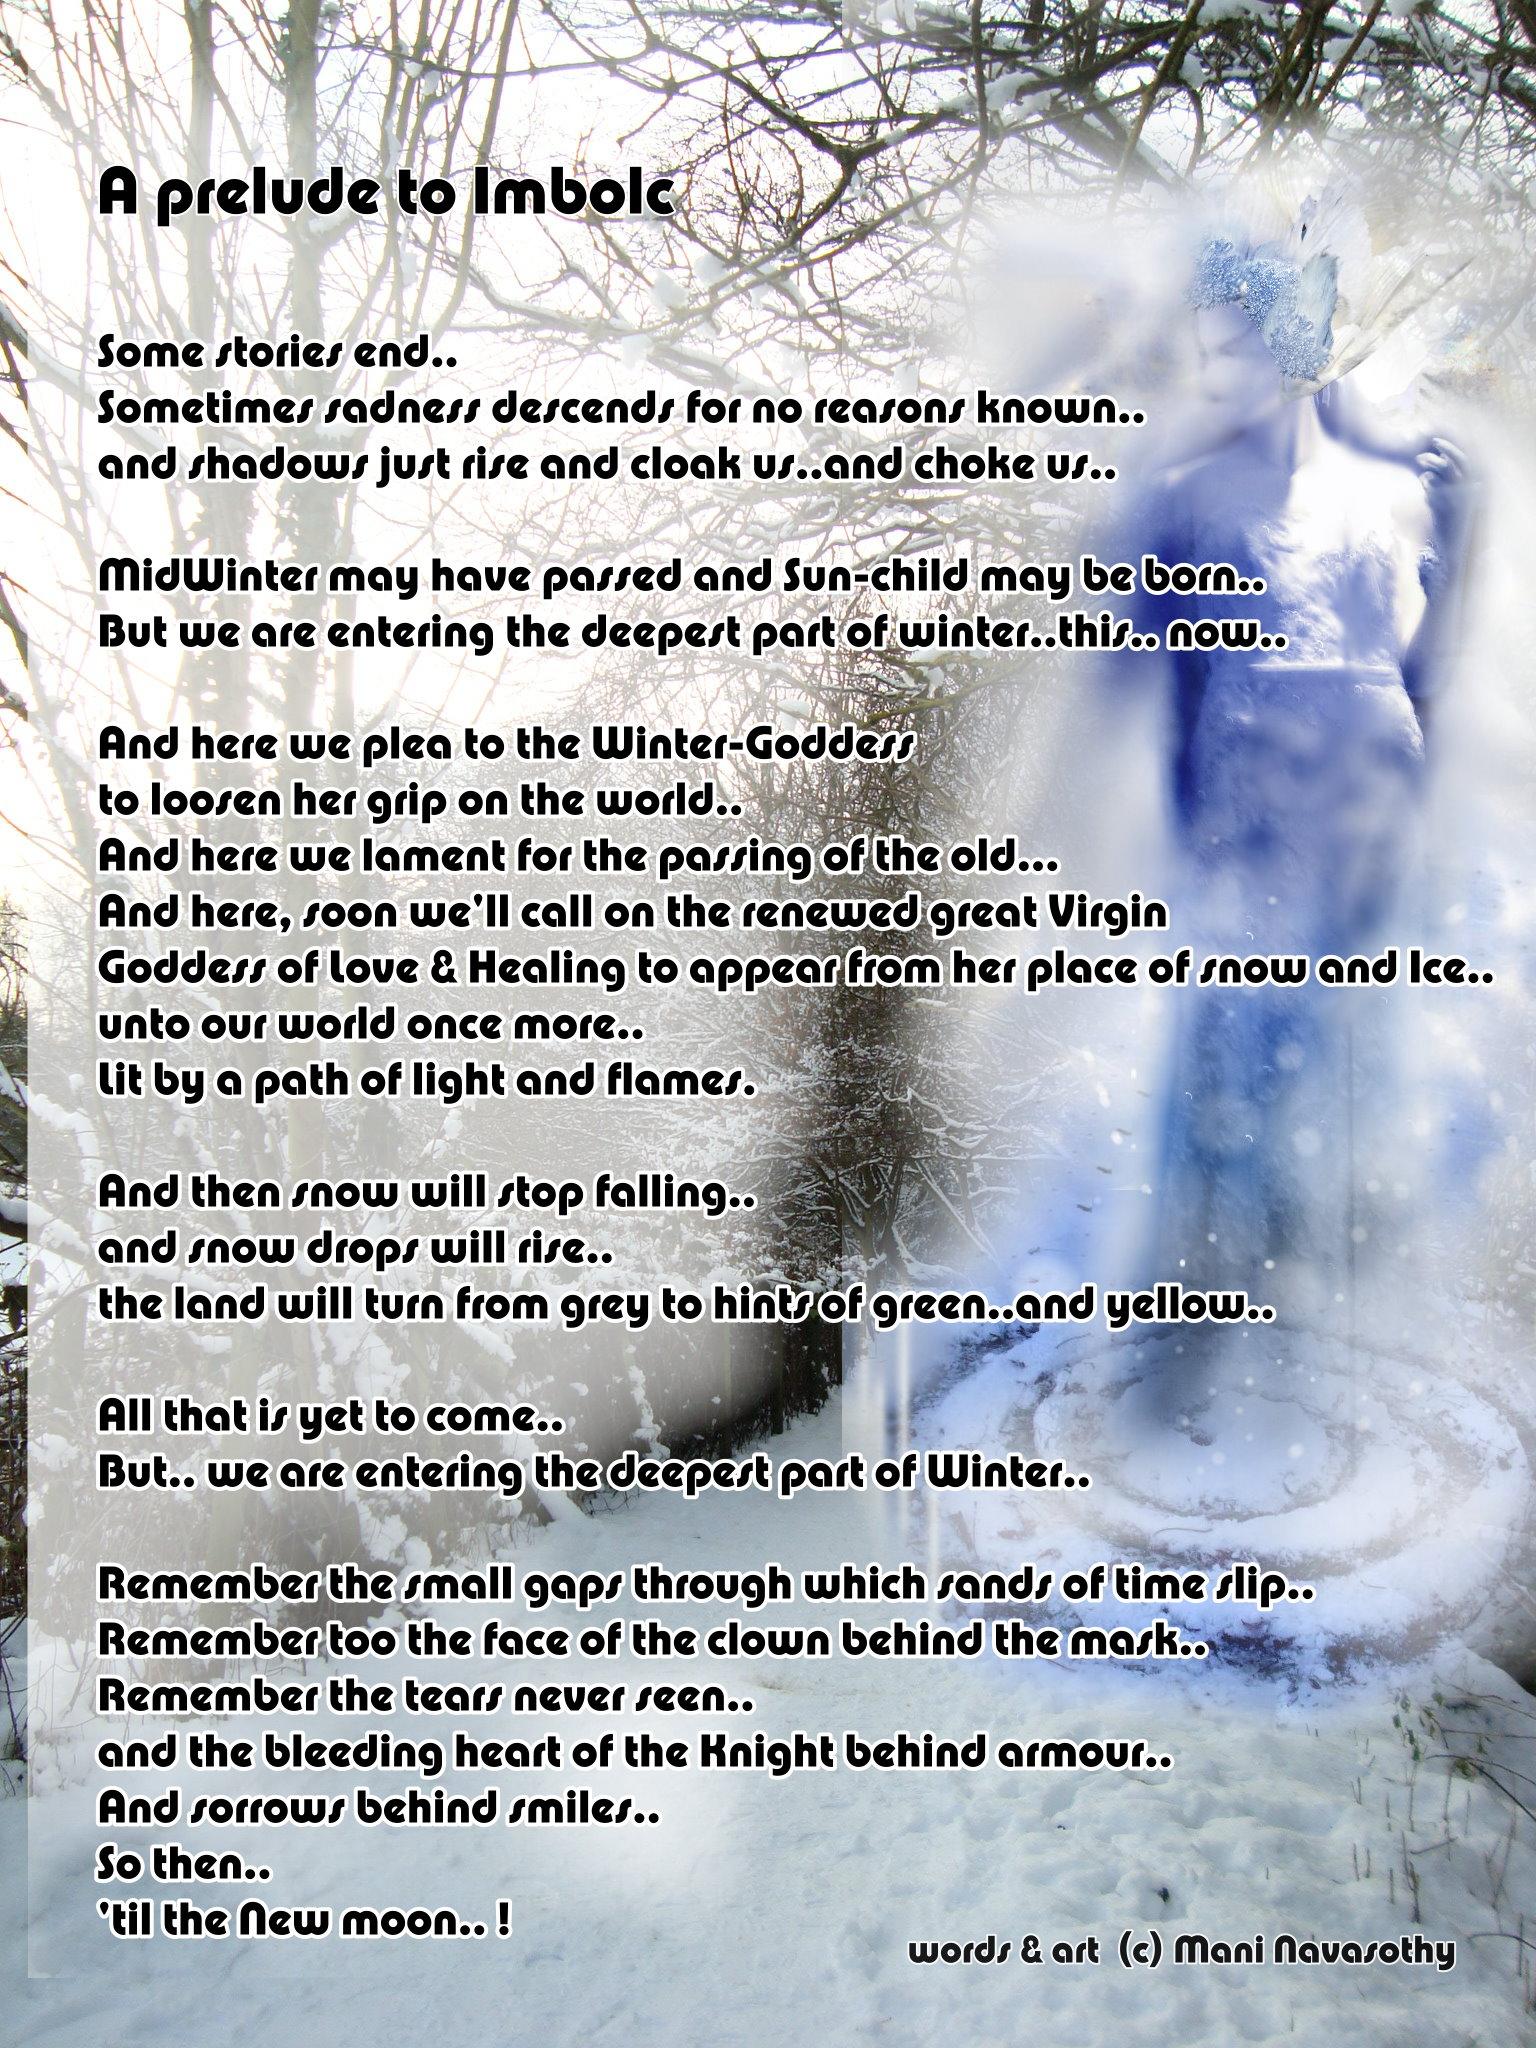 Prelude to Imbolc - Mani Navasothy 2017.jpg